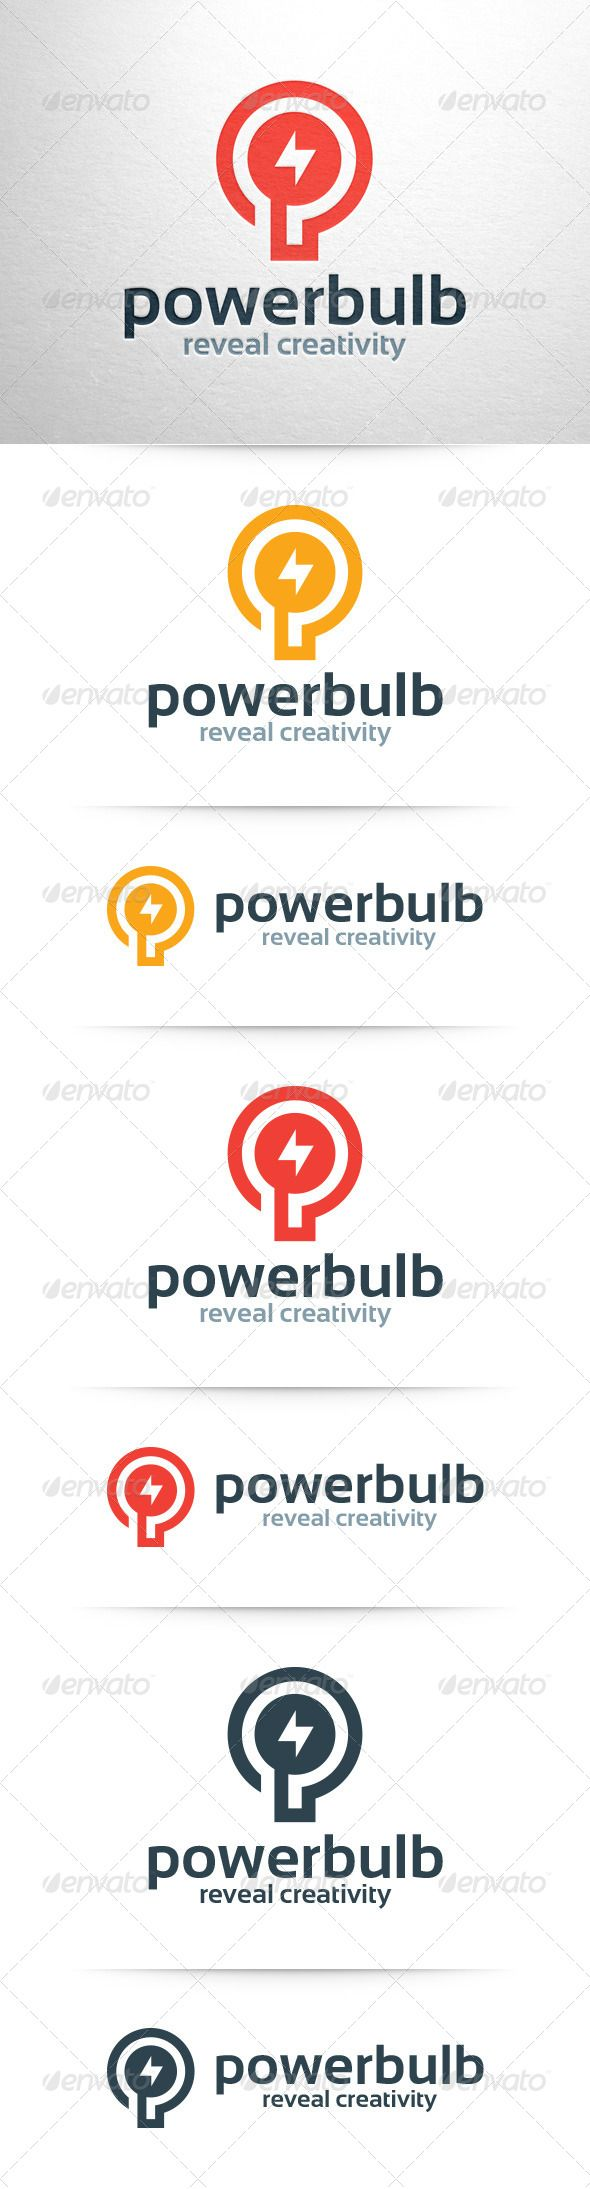 Power Bulb Logo Template — Vector EPS #idea #logo • Available here → https://graphicriver.net/item/power-bulb-logo-template/8294638?ref=pxcr